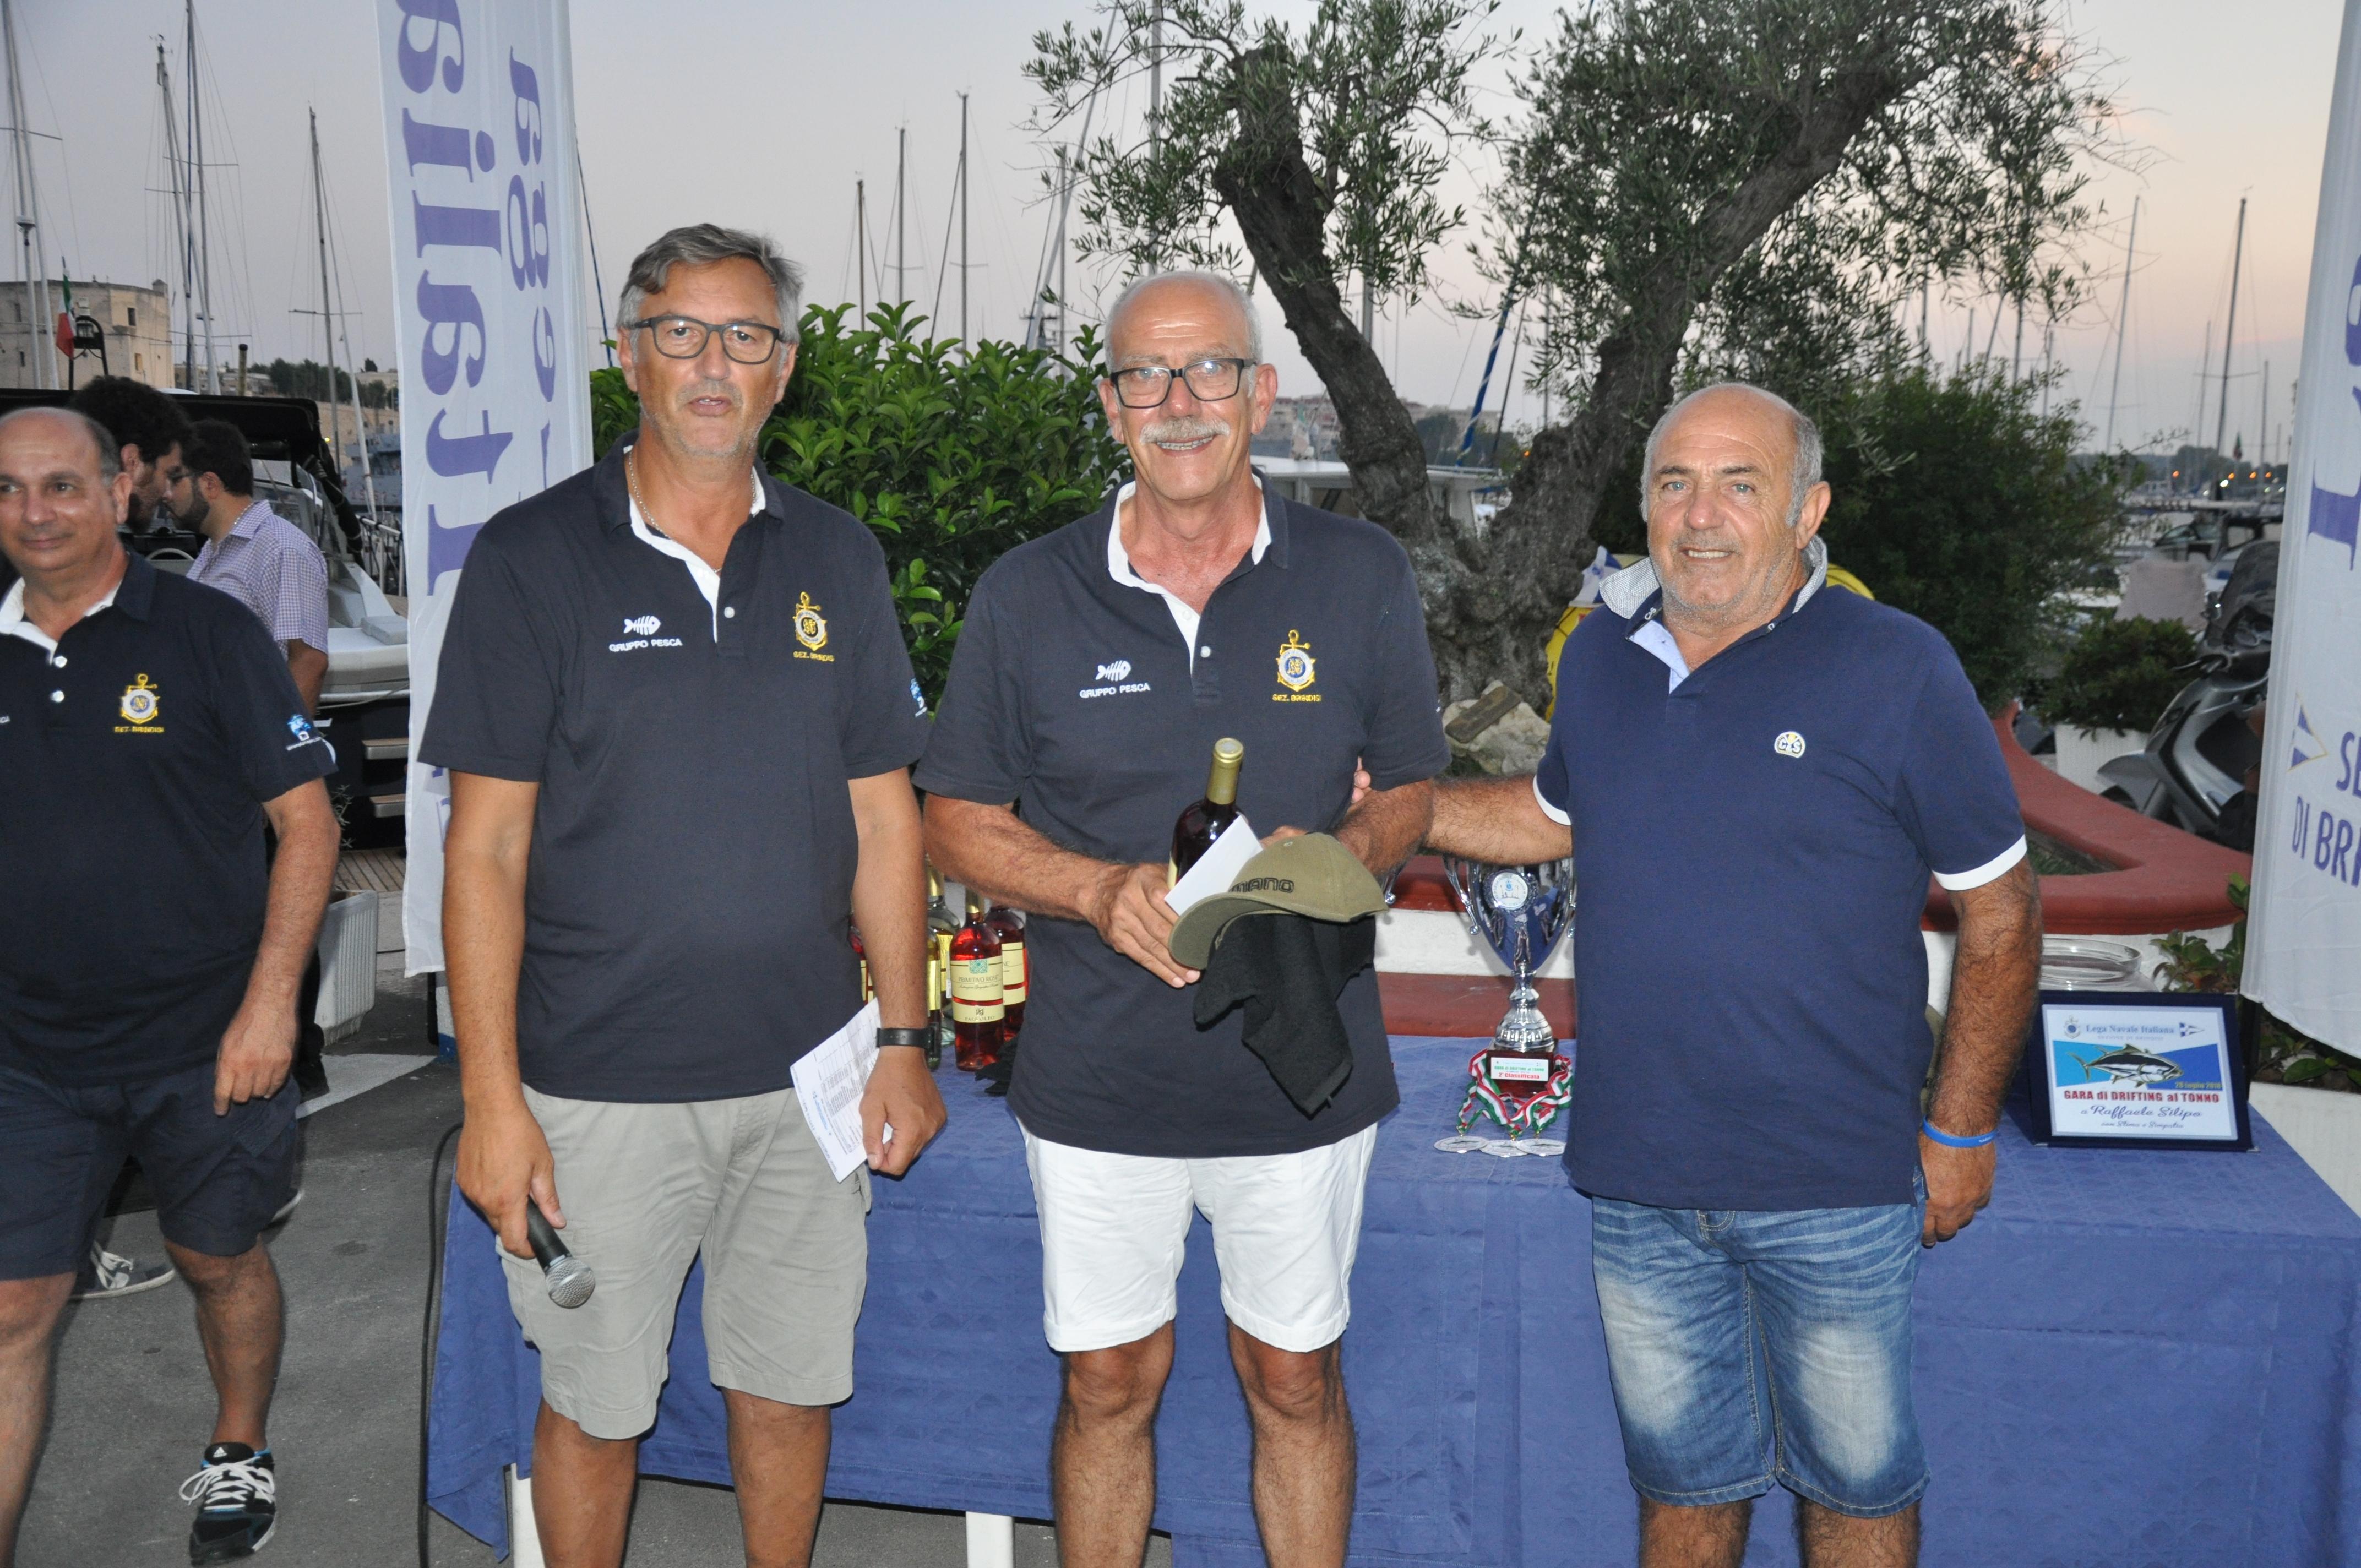 premiazione drifting al tonno 2018 (4)